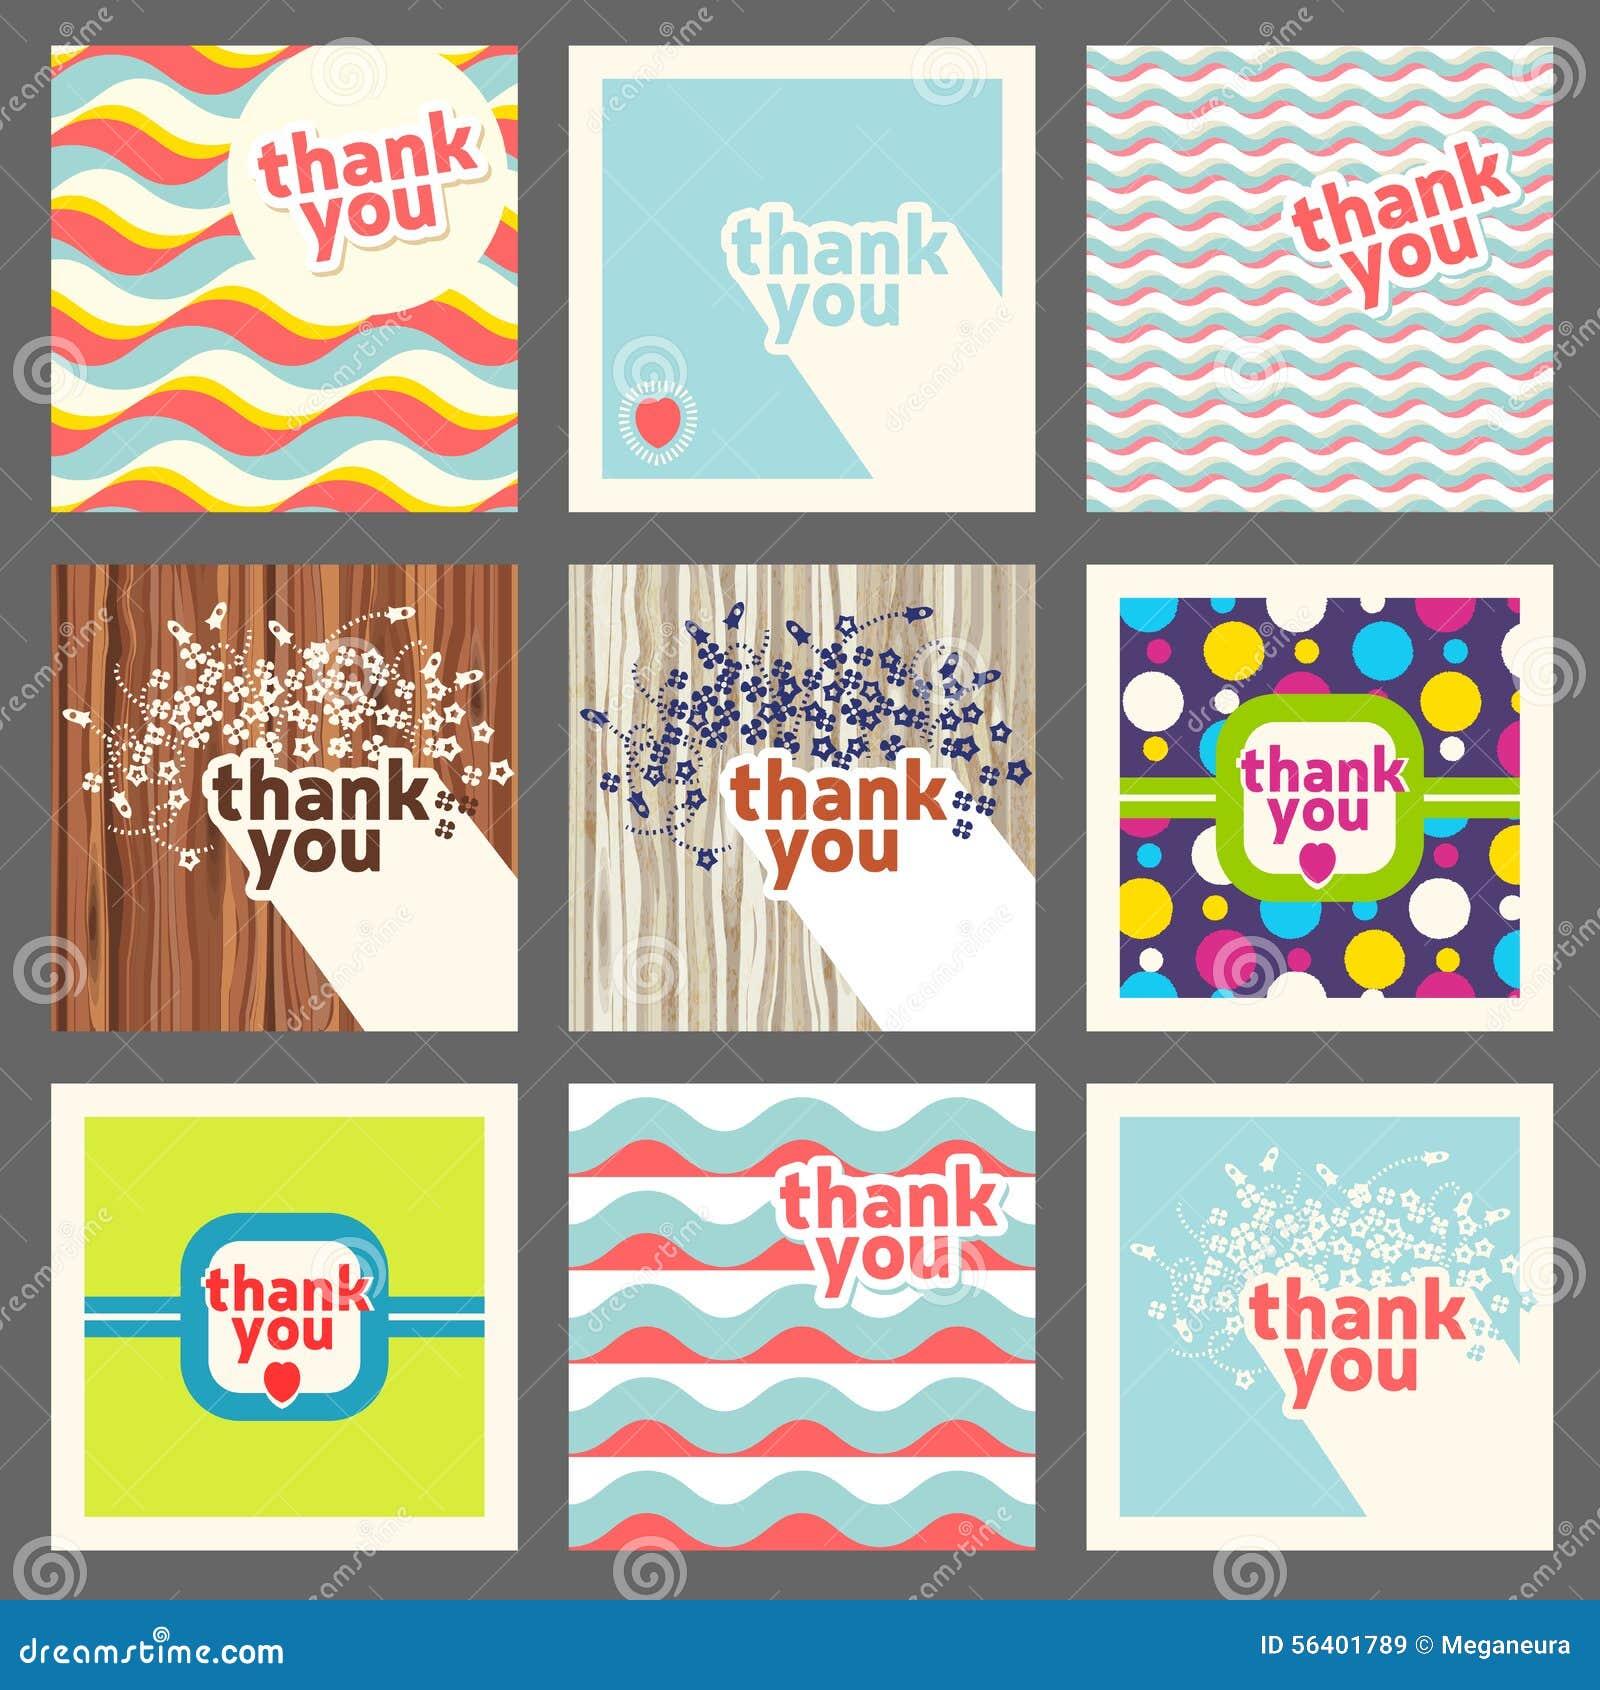 thank you card design template set retro style stock vector image 56401789. Black Bedroom Furniture Sets. Home Design Ideas